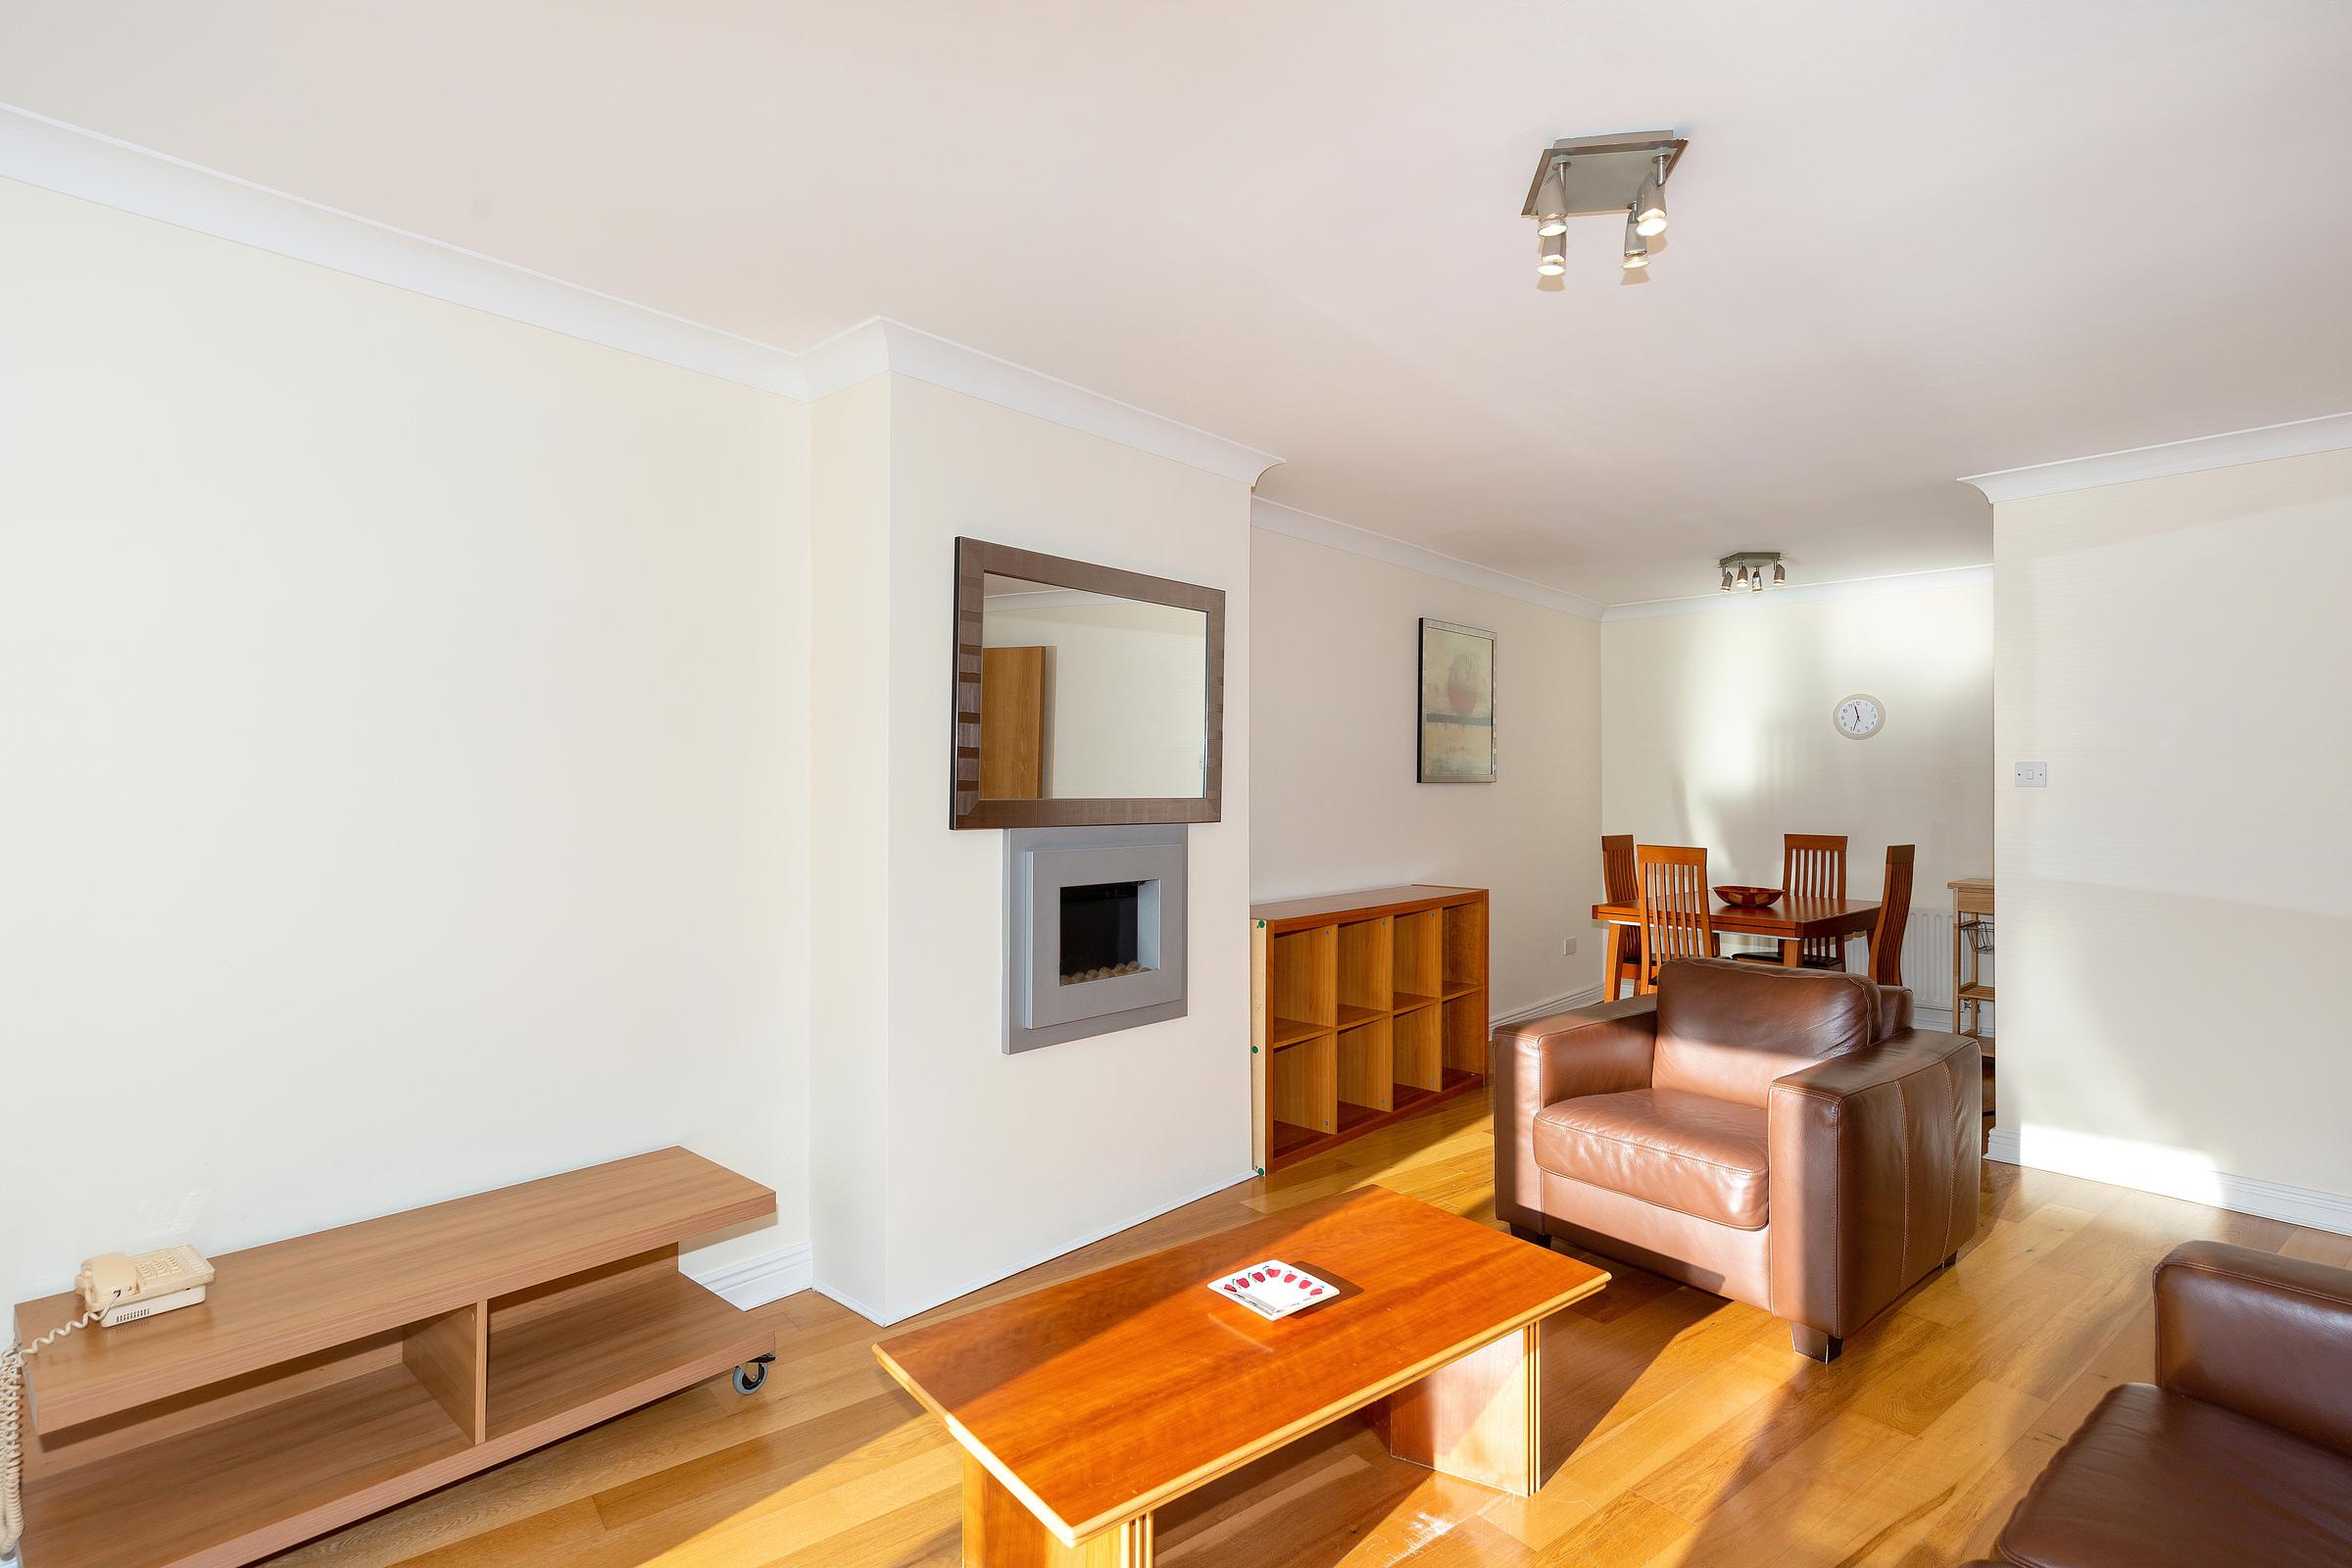 Apartment 20, The Lime, Rockfield, Dundrum, Dublin 14